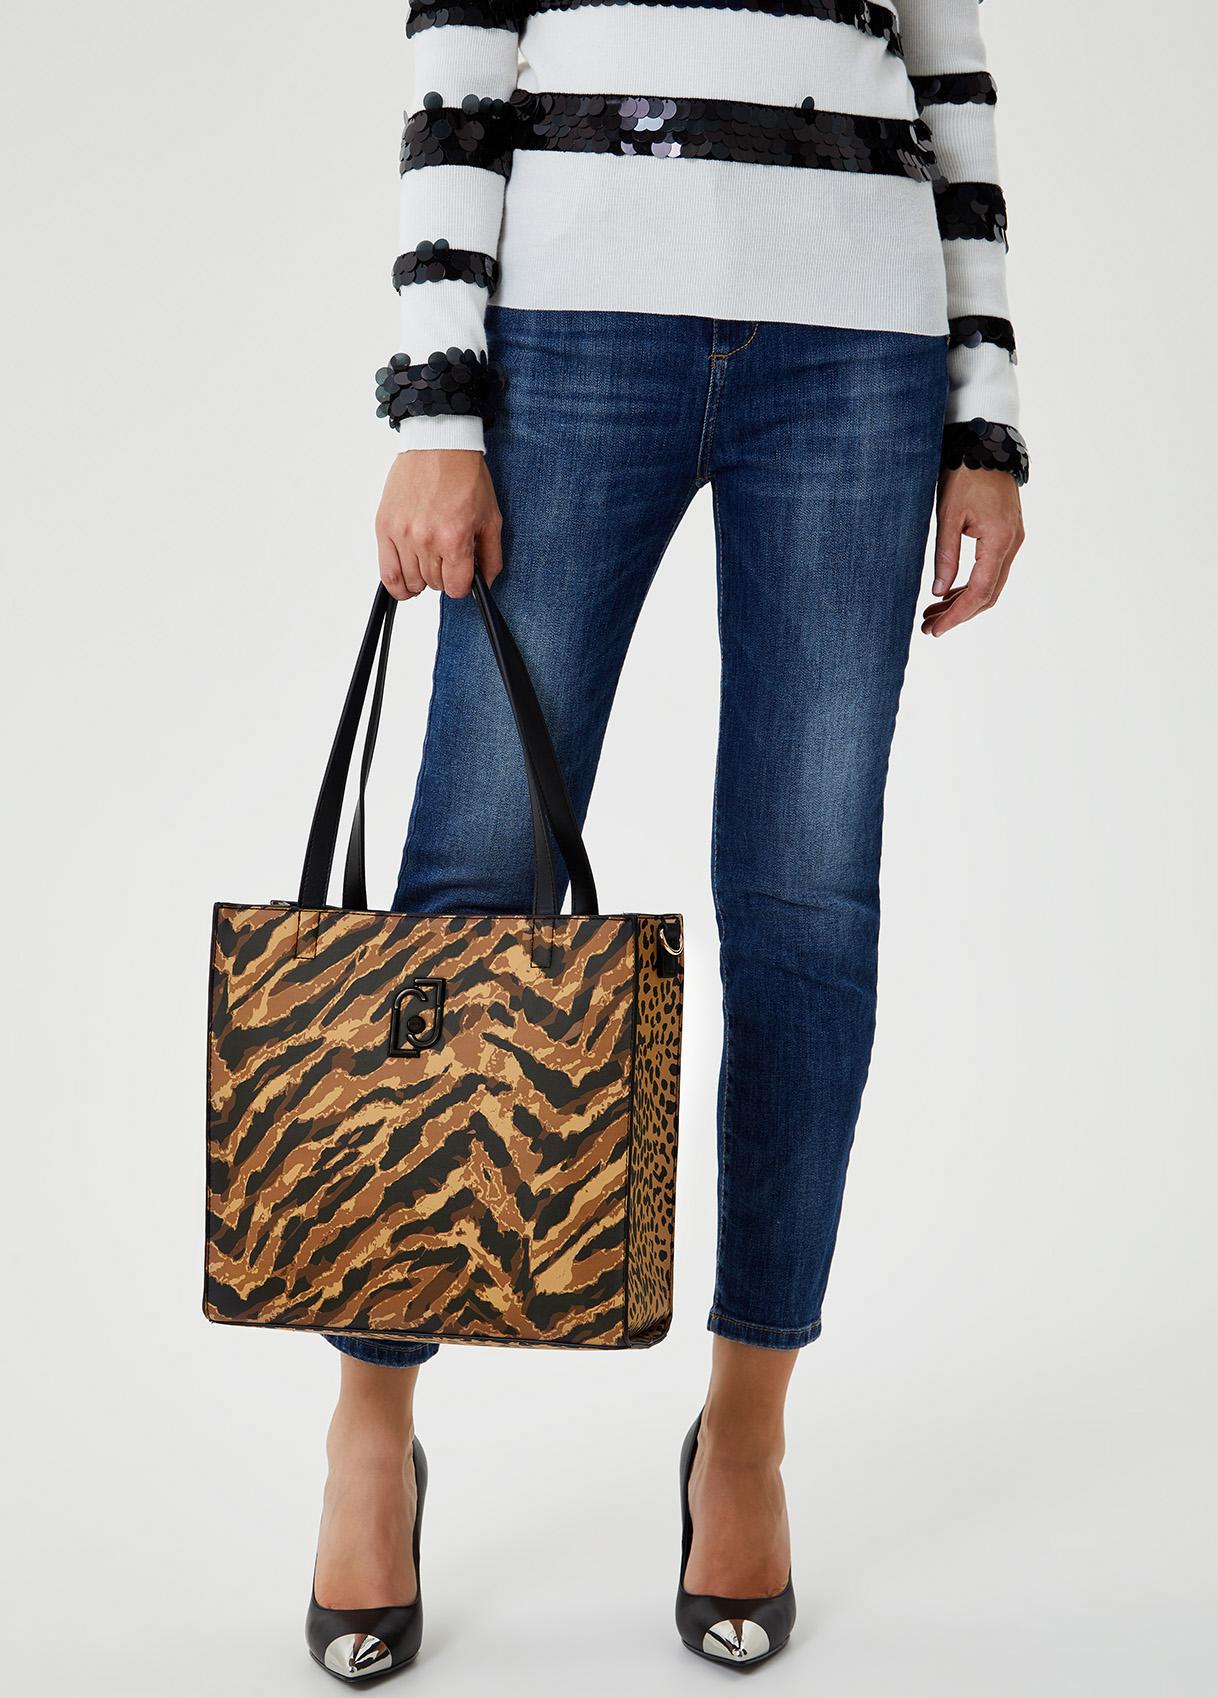 Shopping bag con logo-T9205-liujo-large